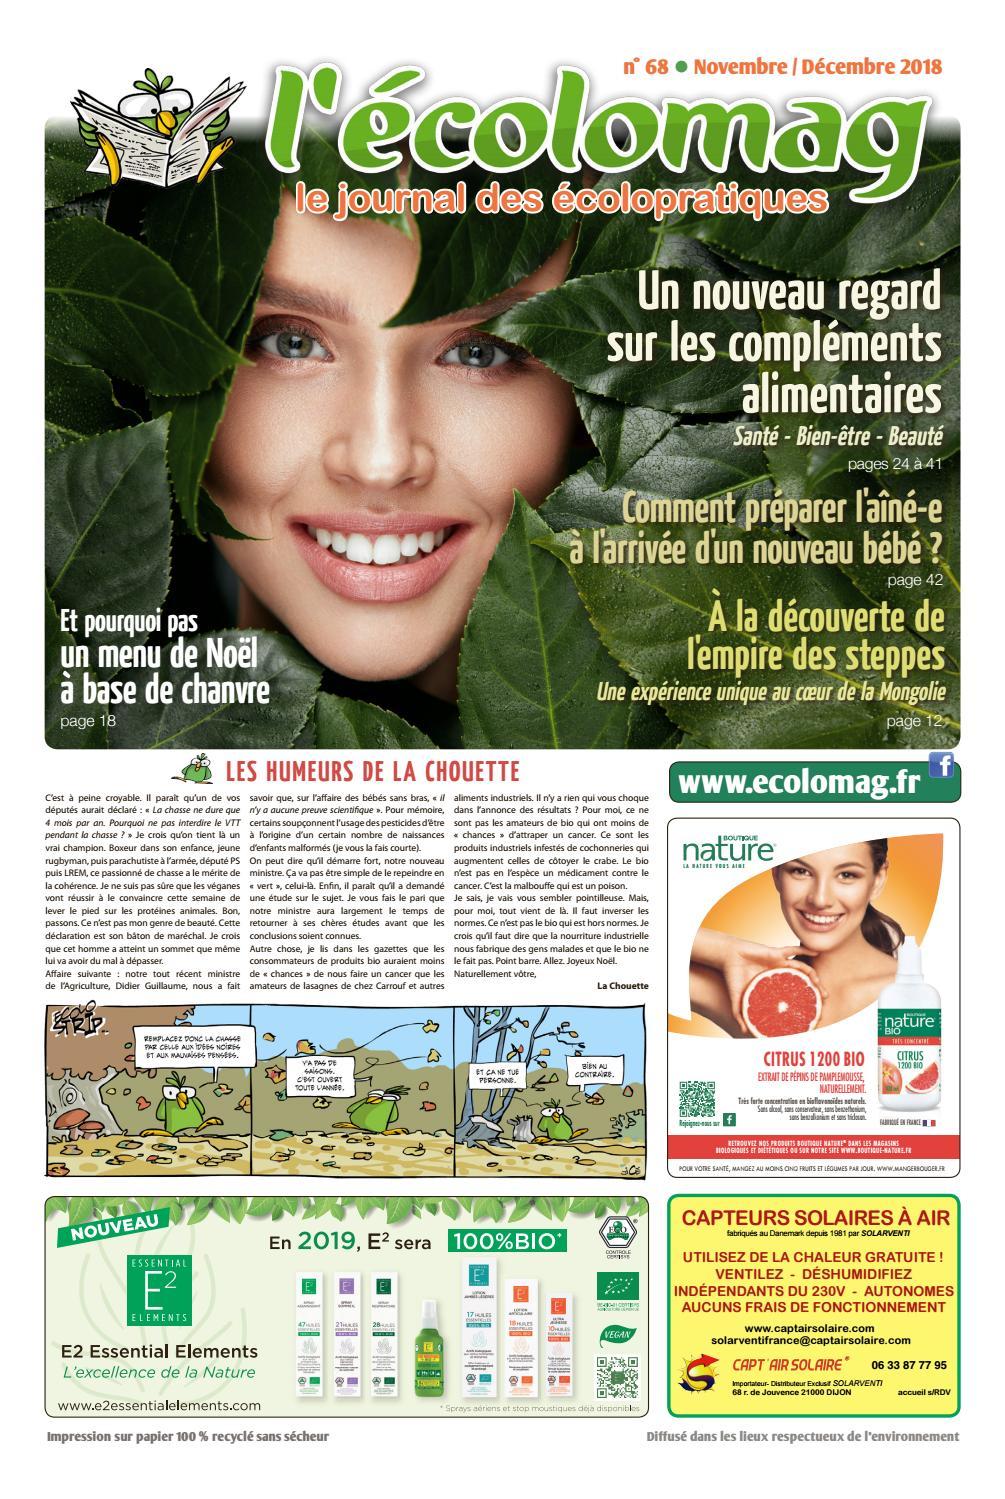 L Ecolomag n°68 by L Ecolomag - issuu 316bd8164f4c